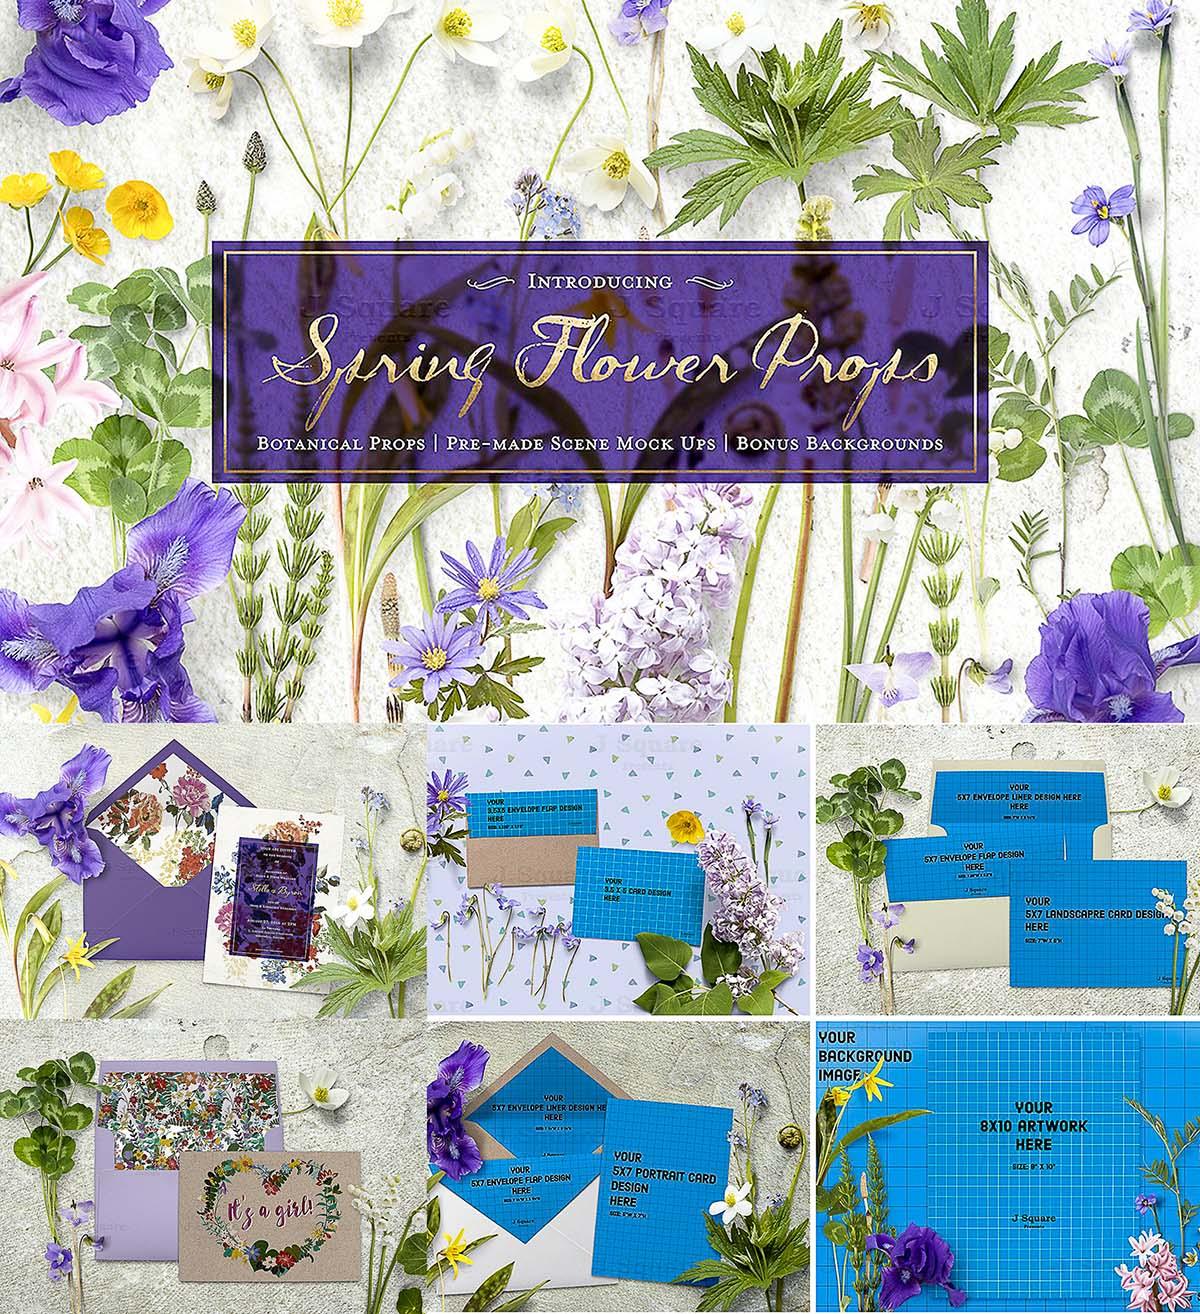 Spring flowers props mockup + bonus